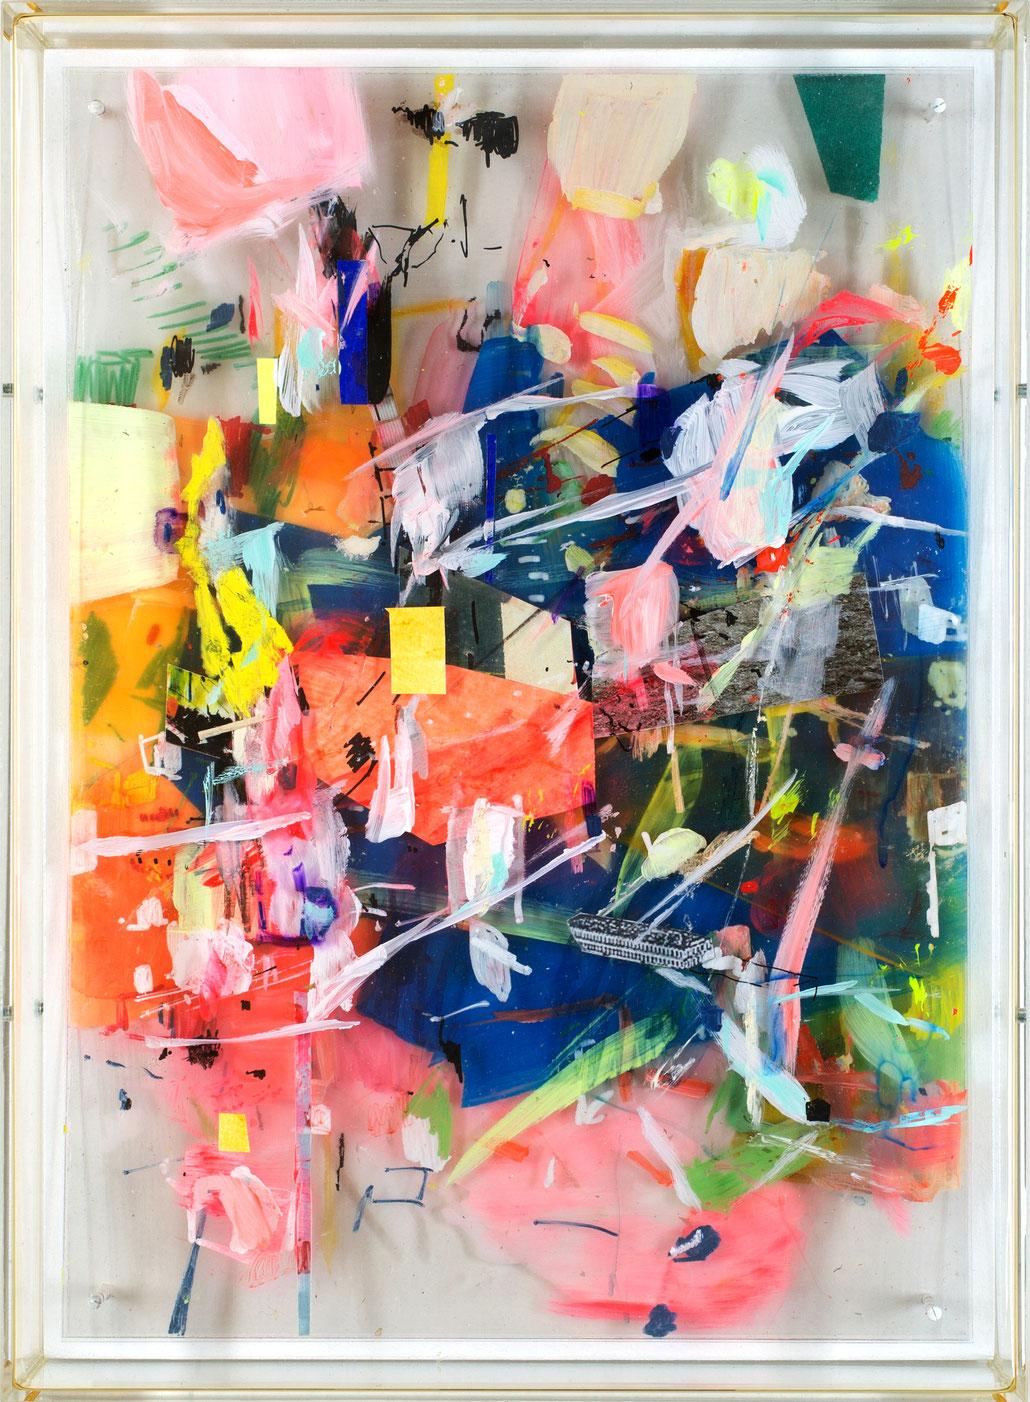 Kunst als Geschenkidee - junge belgische Kunst von Stephanie Devoss (Stefanie De Voss)